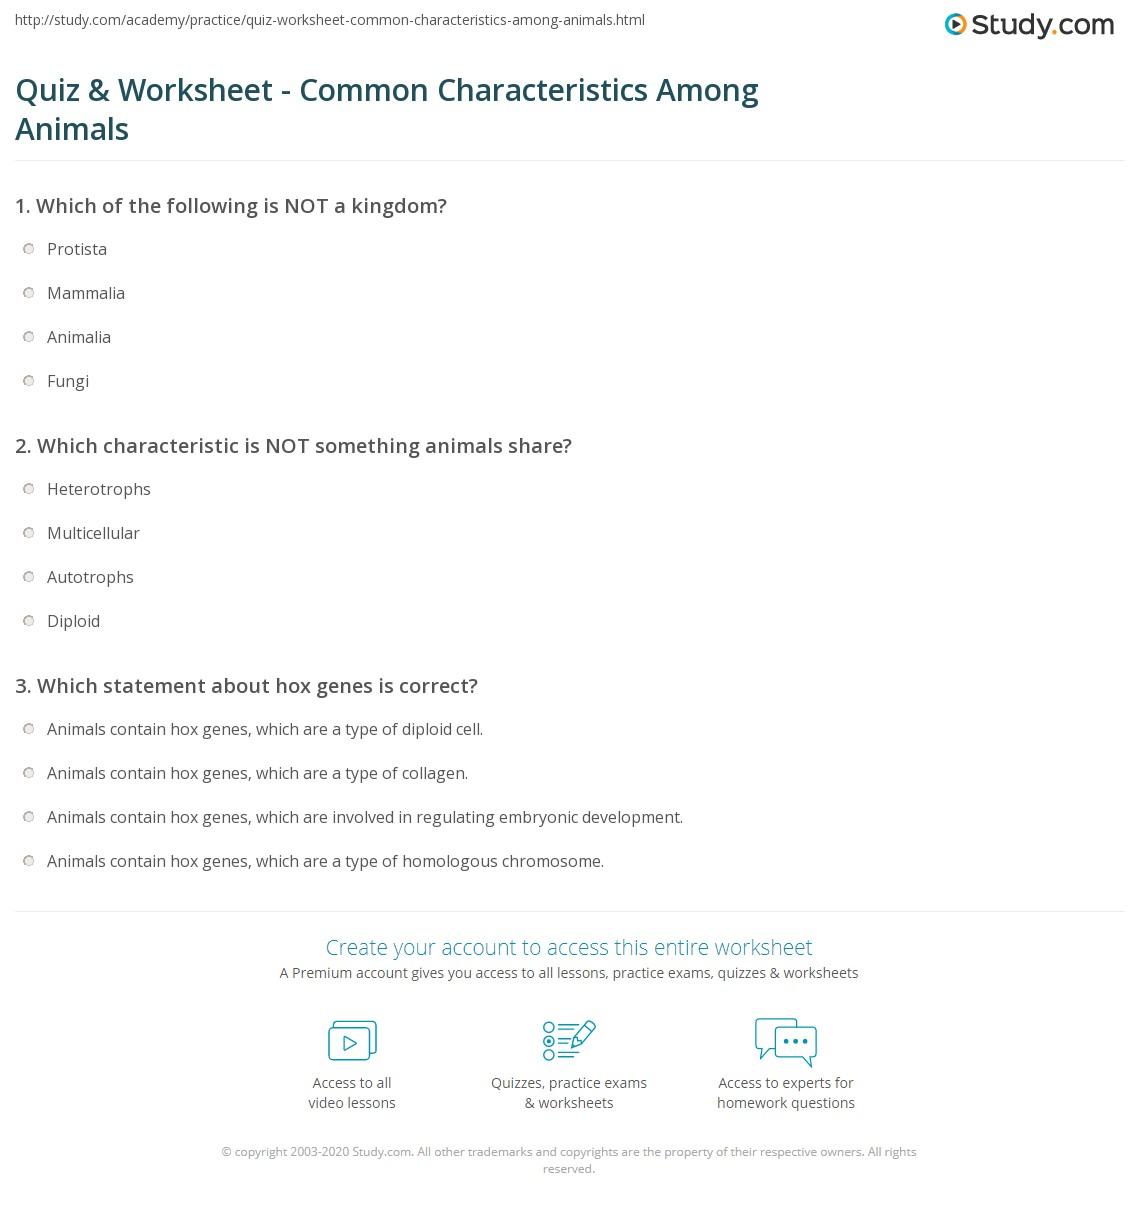 Quiz & Worksheet mon Characteristics Among Animals